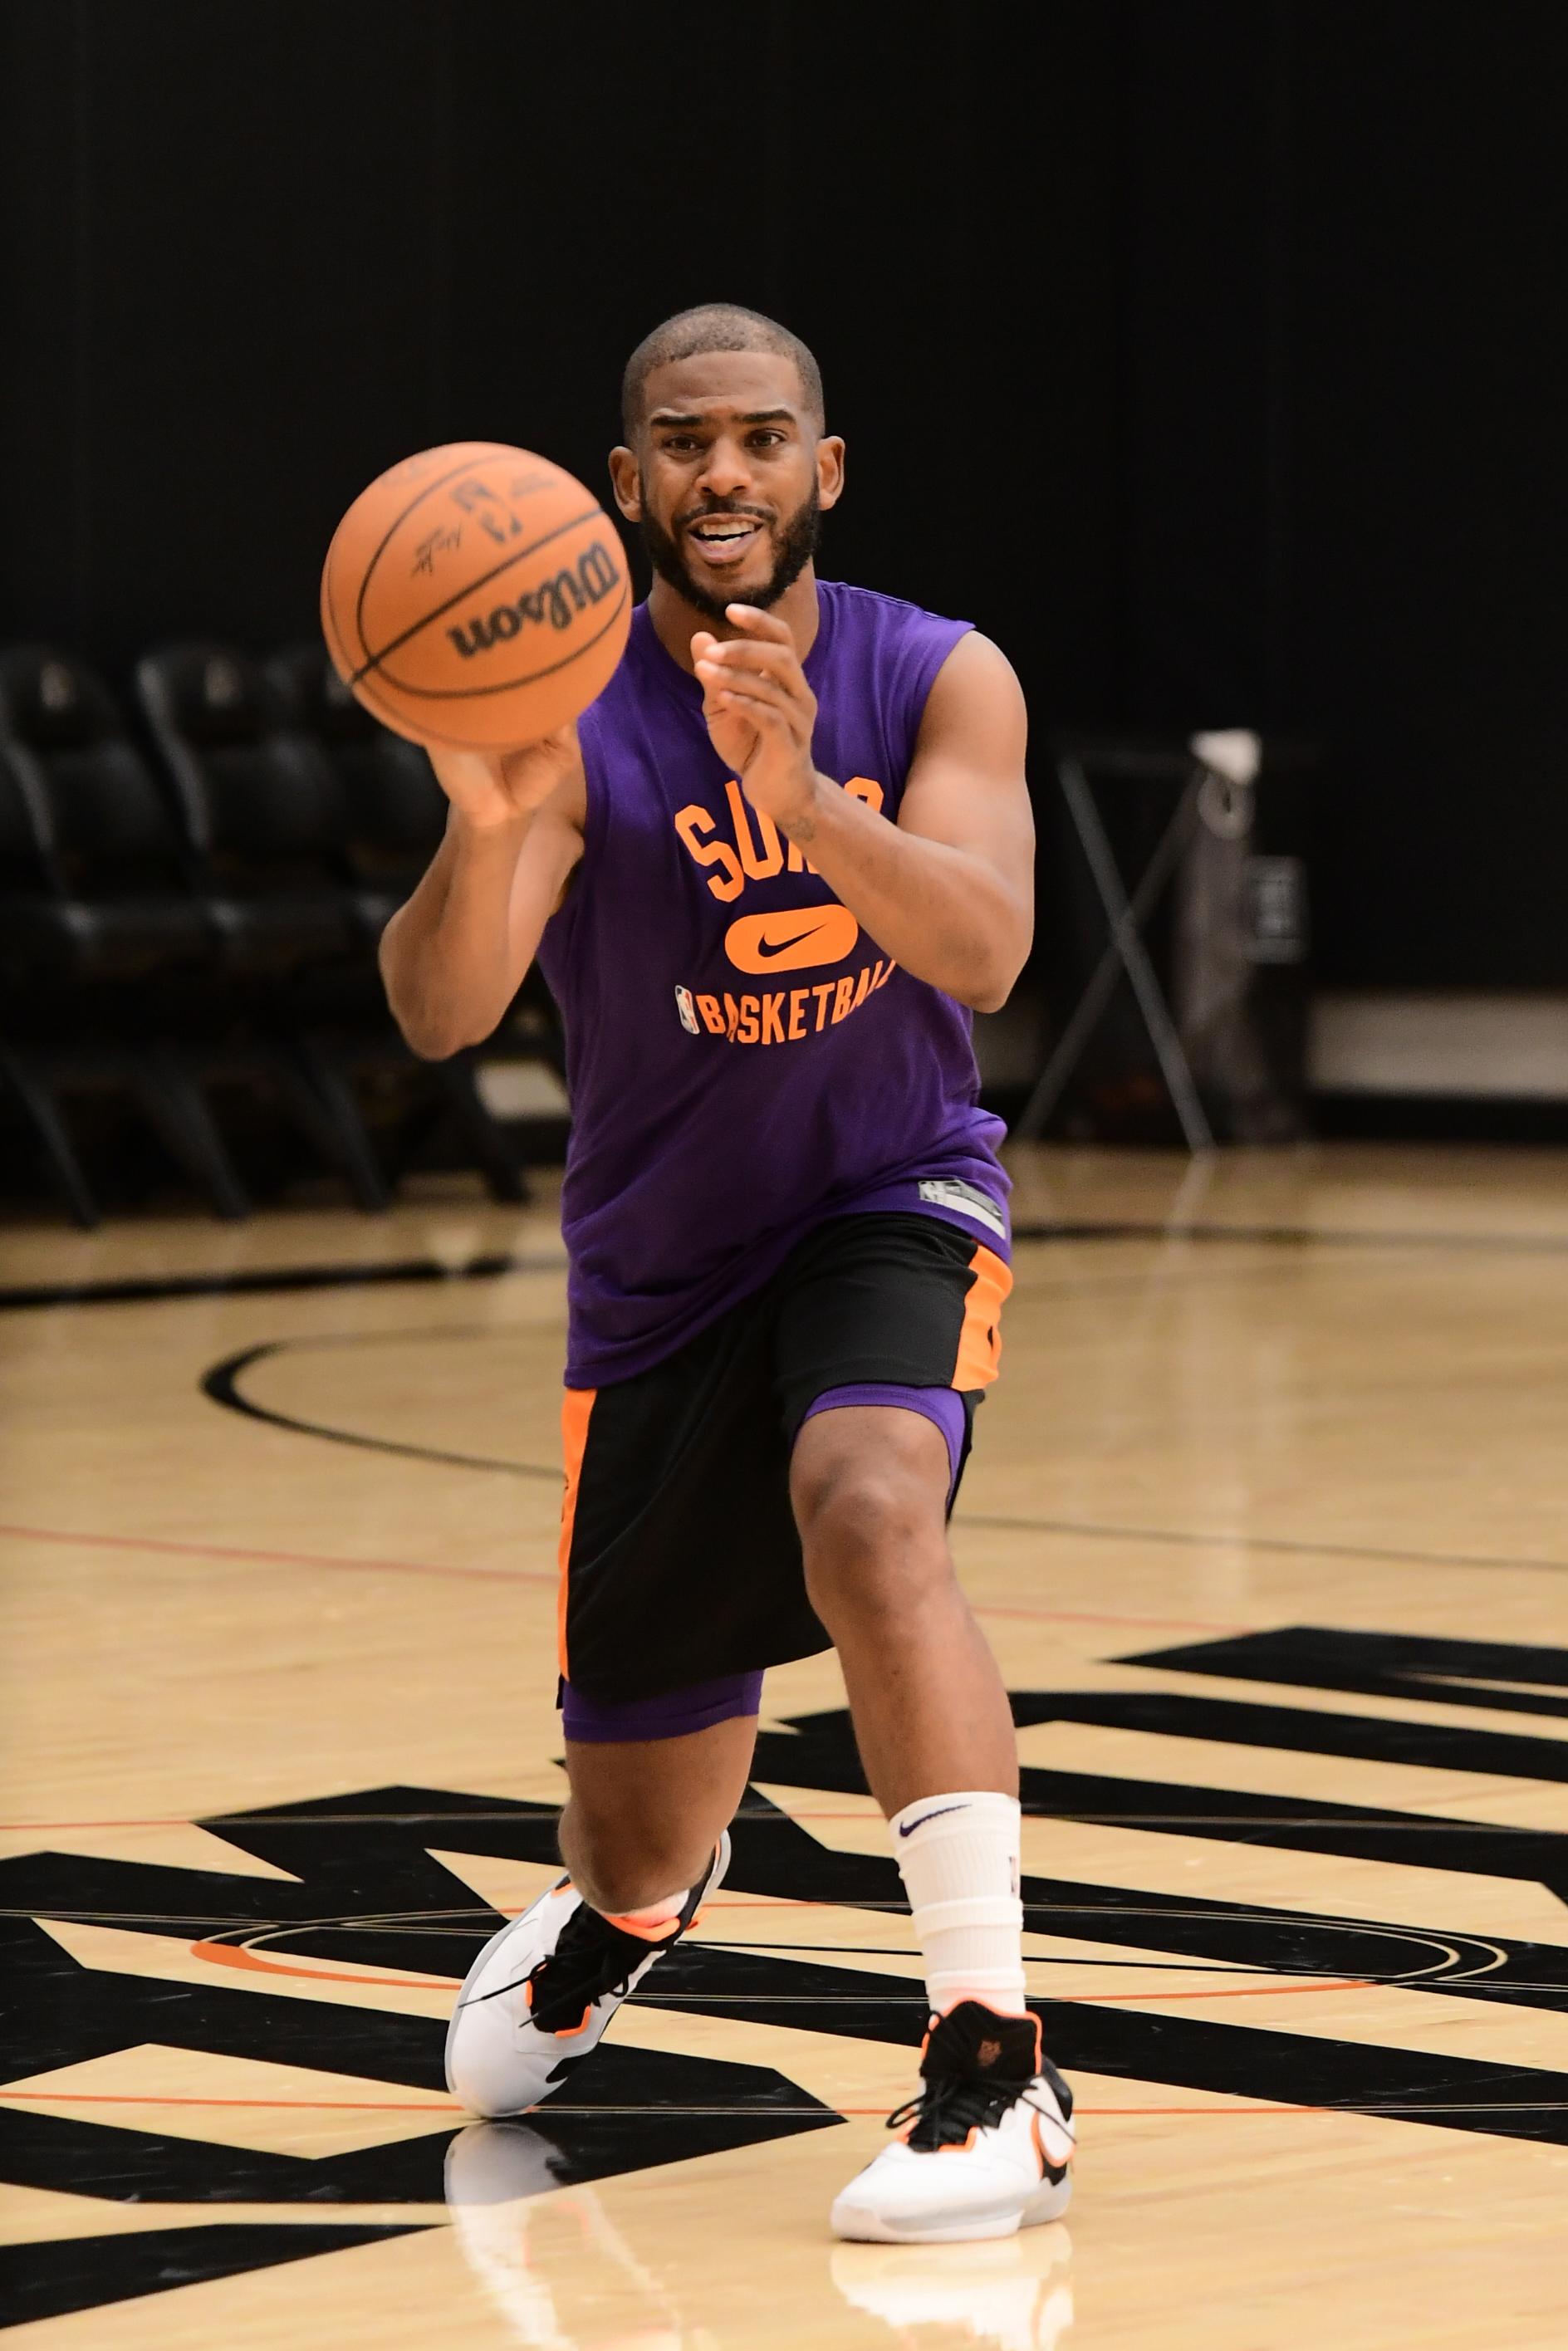 Phoenix Suns All Access Practice